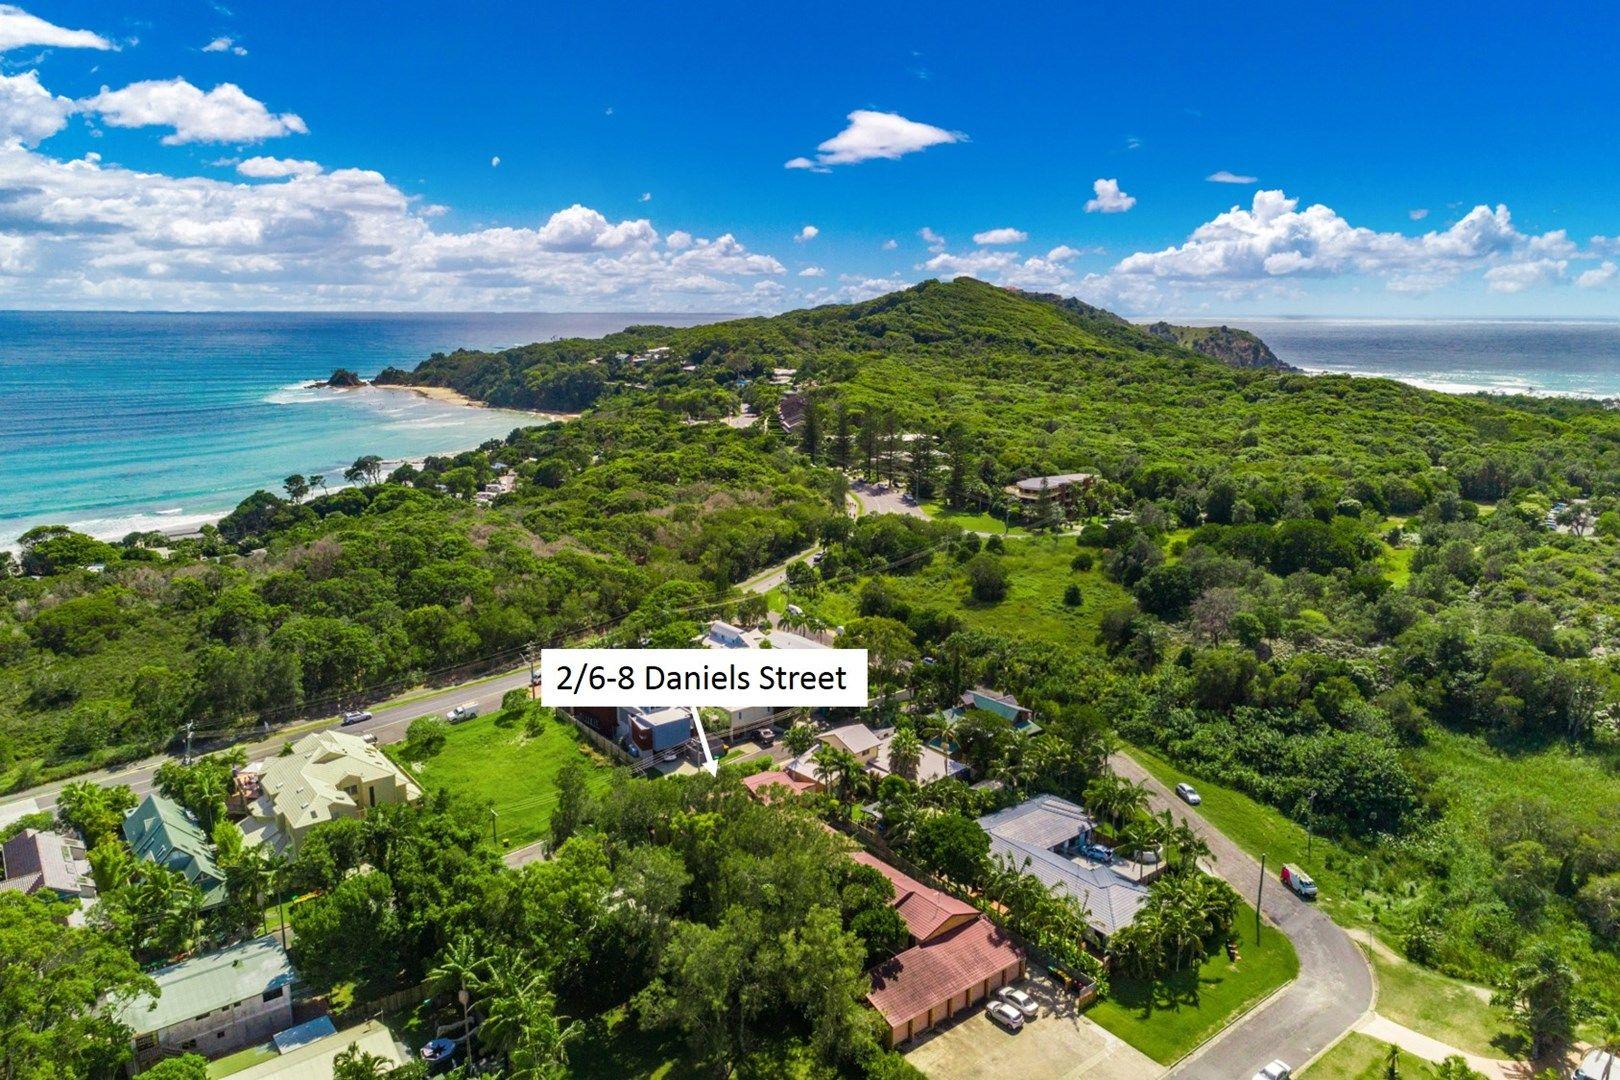 2/6-8 Daniels Street, Byron Bay NSW 2481, Image 0